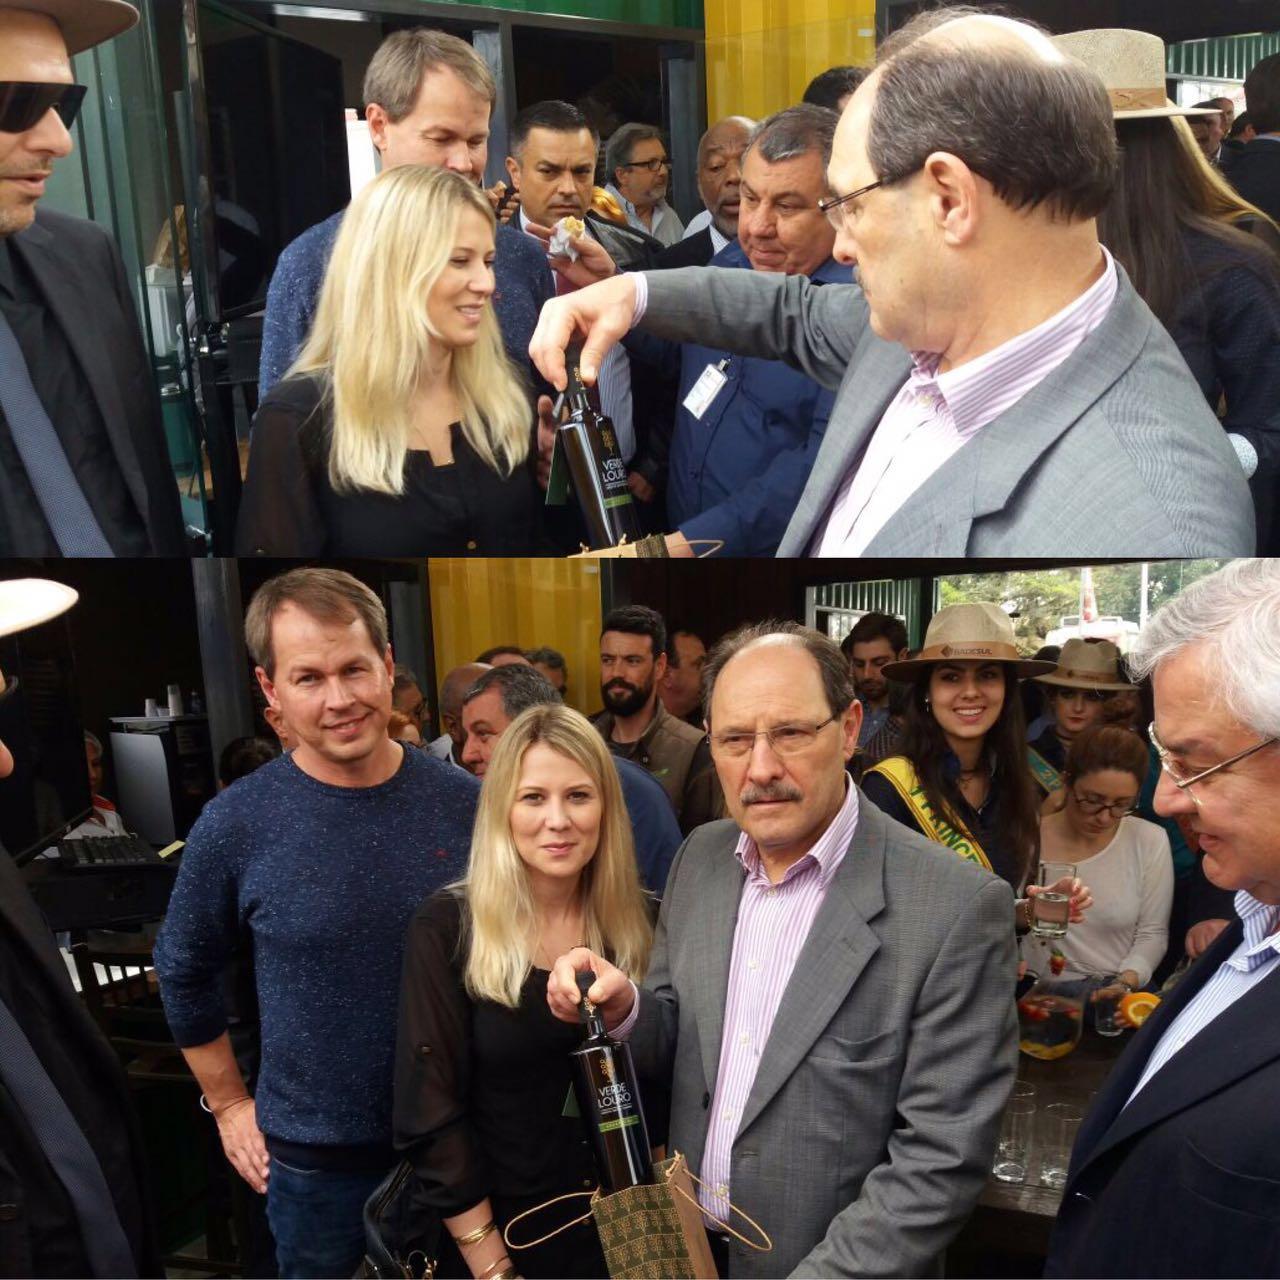 Governador Gaúcho recebe azeite Verde Louro na Expointer 2016.